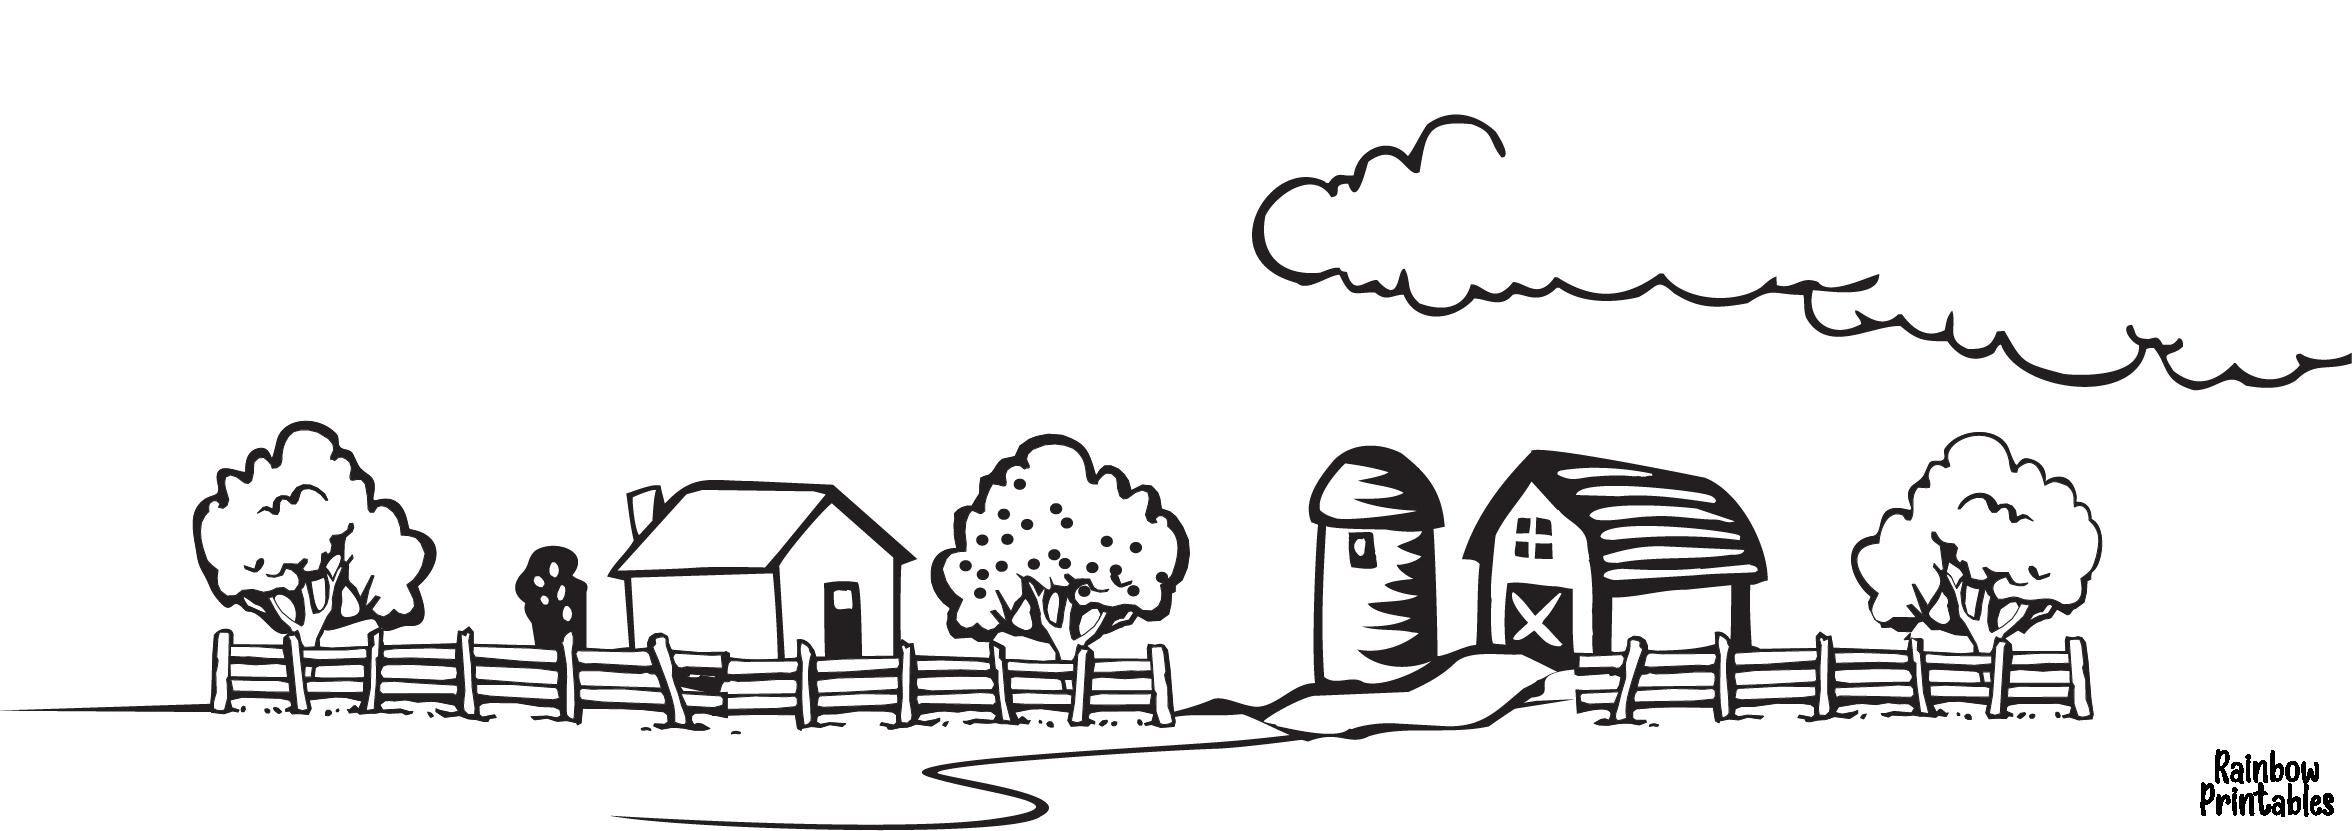 free-cartoon-line-art-world-city-farm-landscape-coloring-page-for-kids